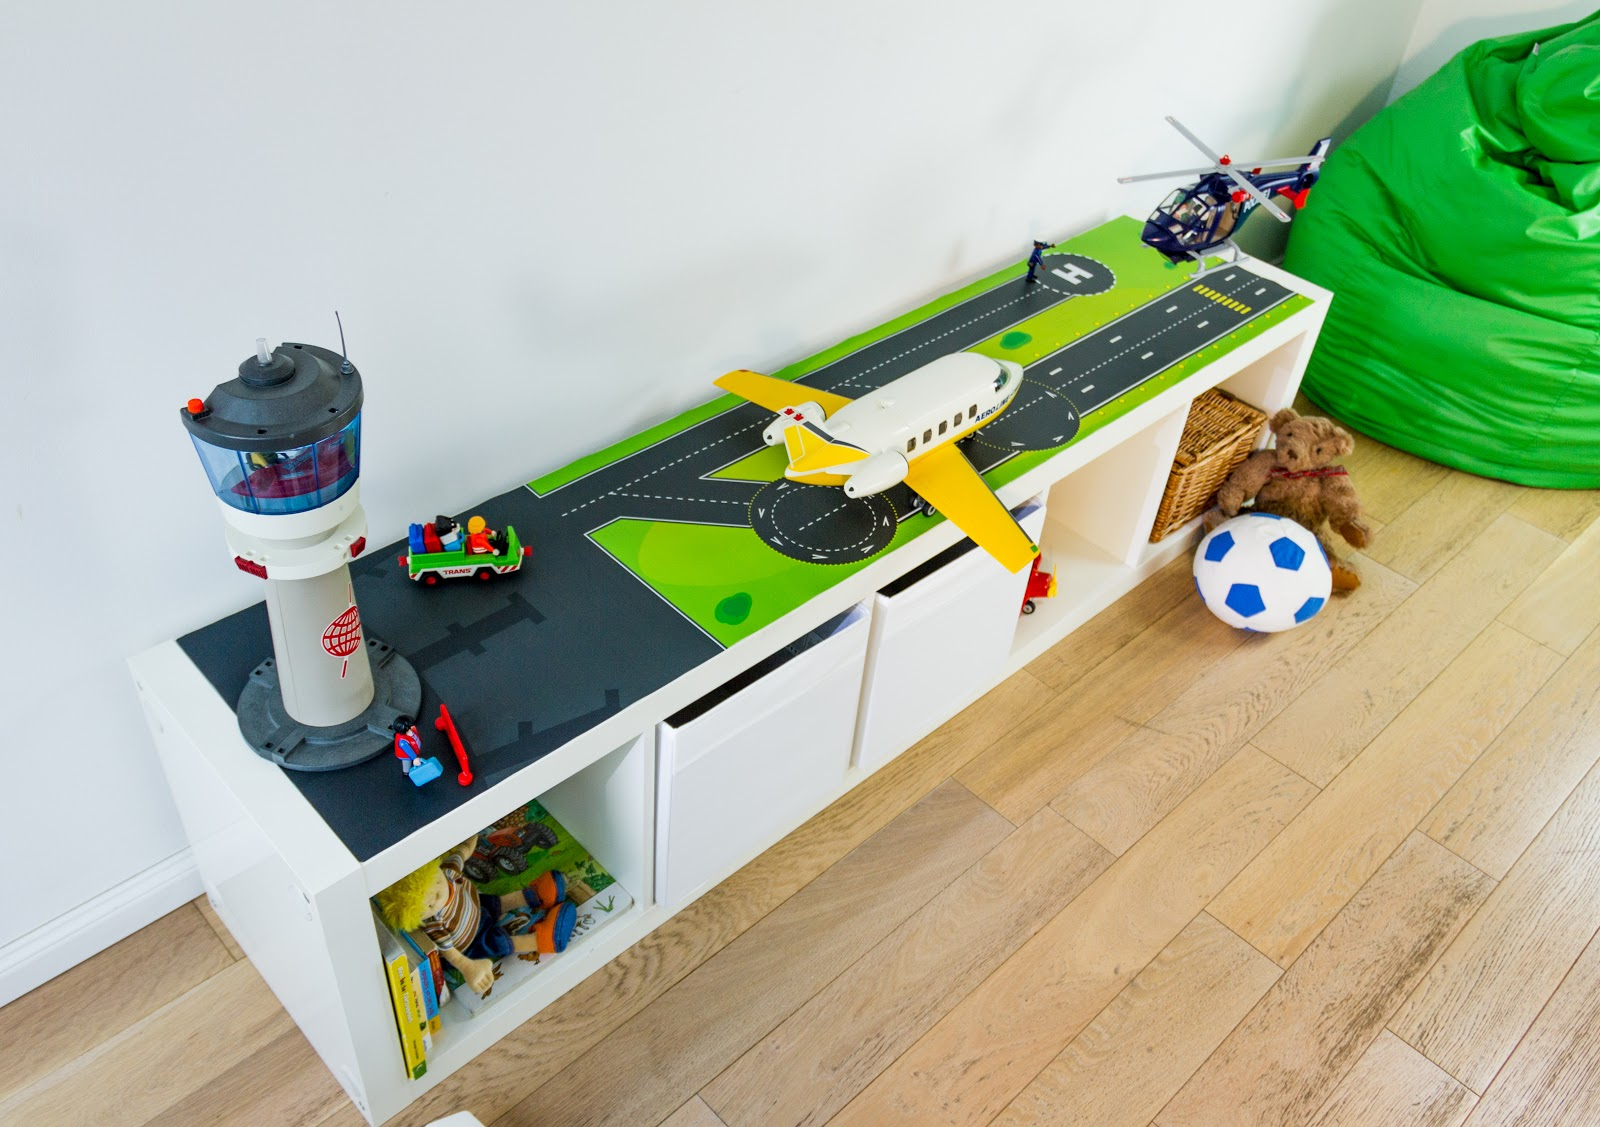 Verlockendes limmaland news aus bens zimmer - Lego wandtattoo ...